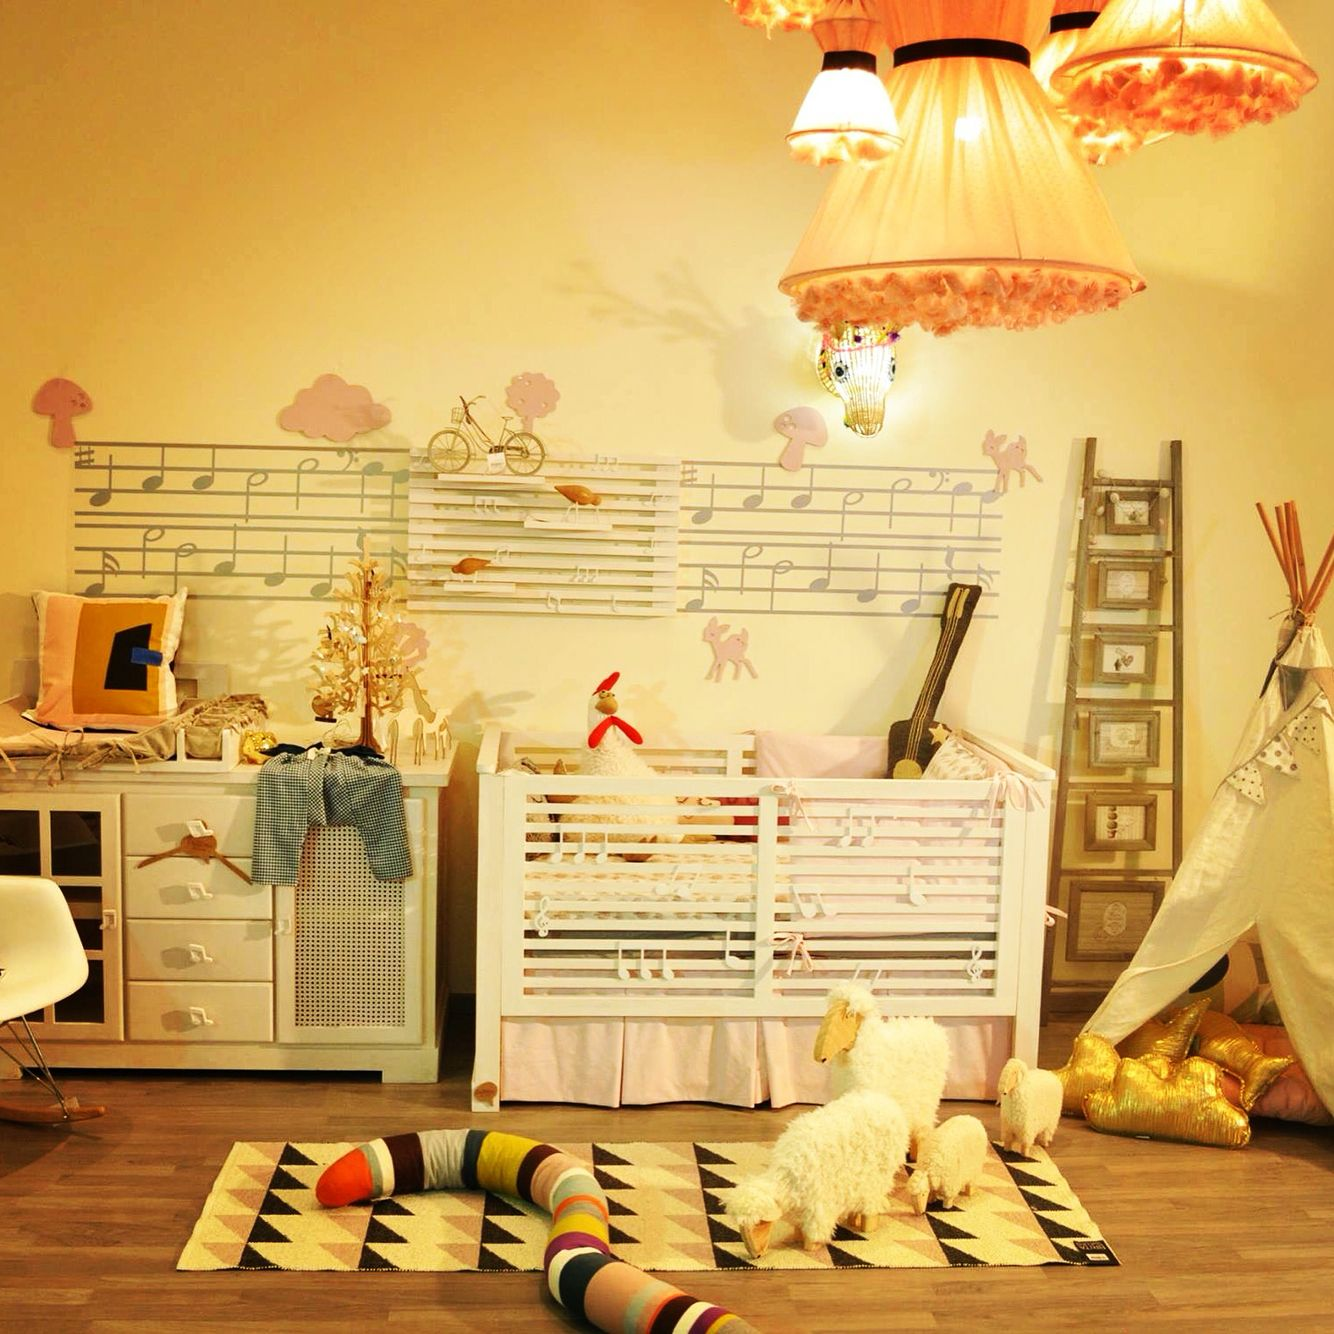 chambre bb fun color art ferm living brita sweden by potiron kid store casablanca - Chambre Bebe Jaune Moutarde